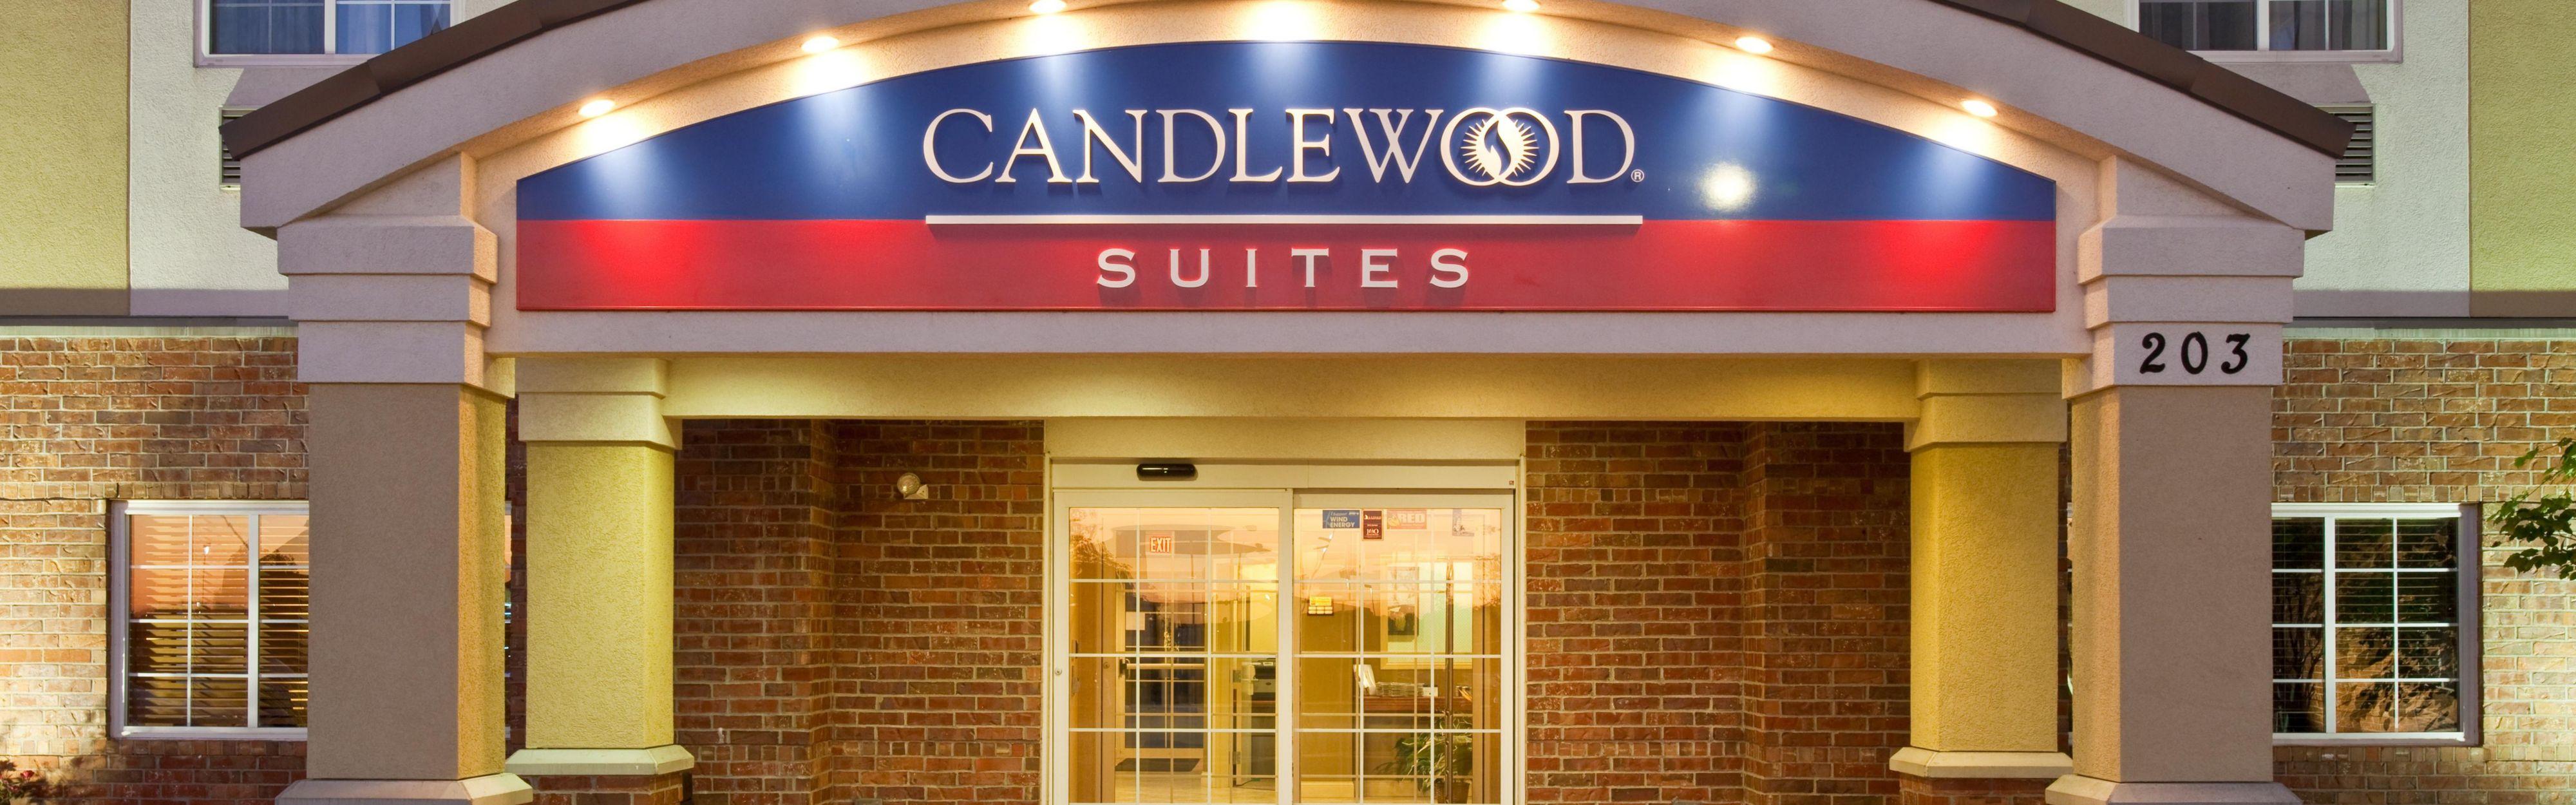 Candlewood Suites Bloomington-Normal image 0